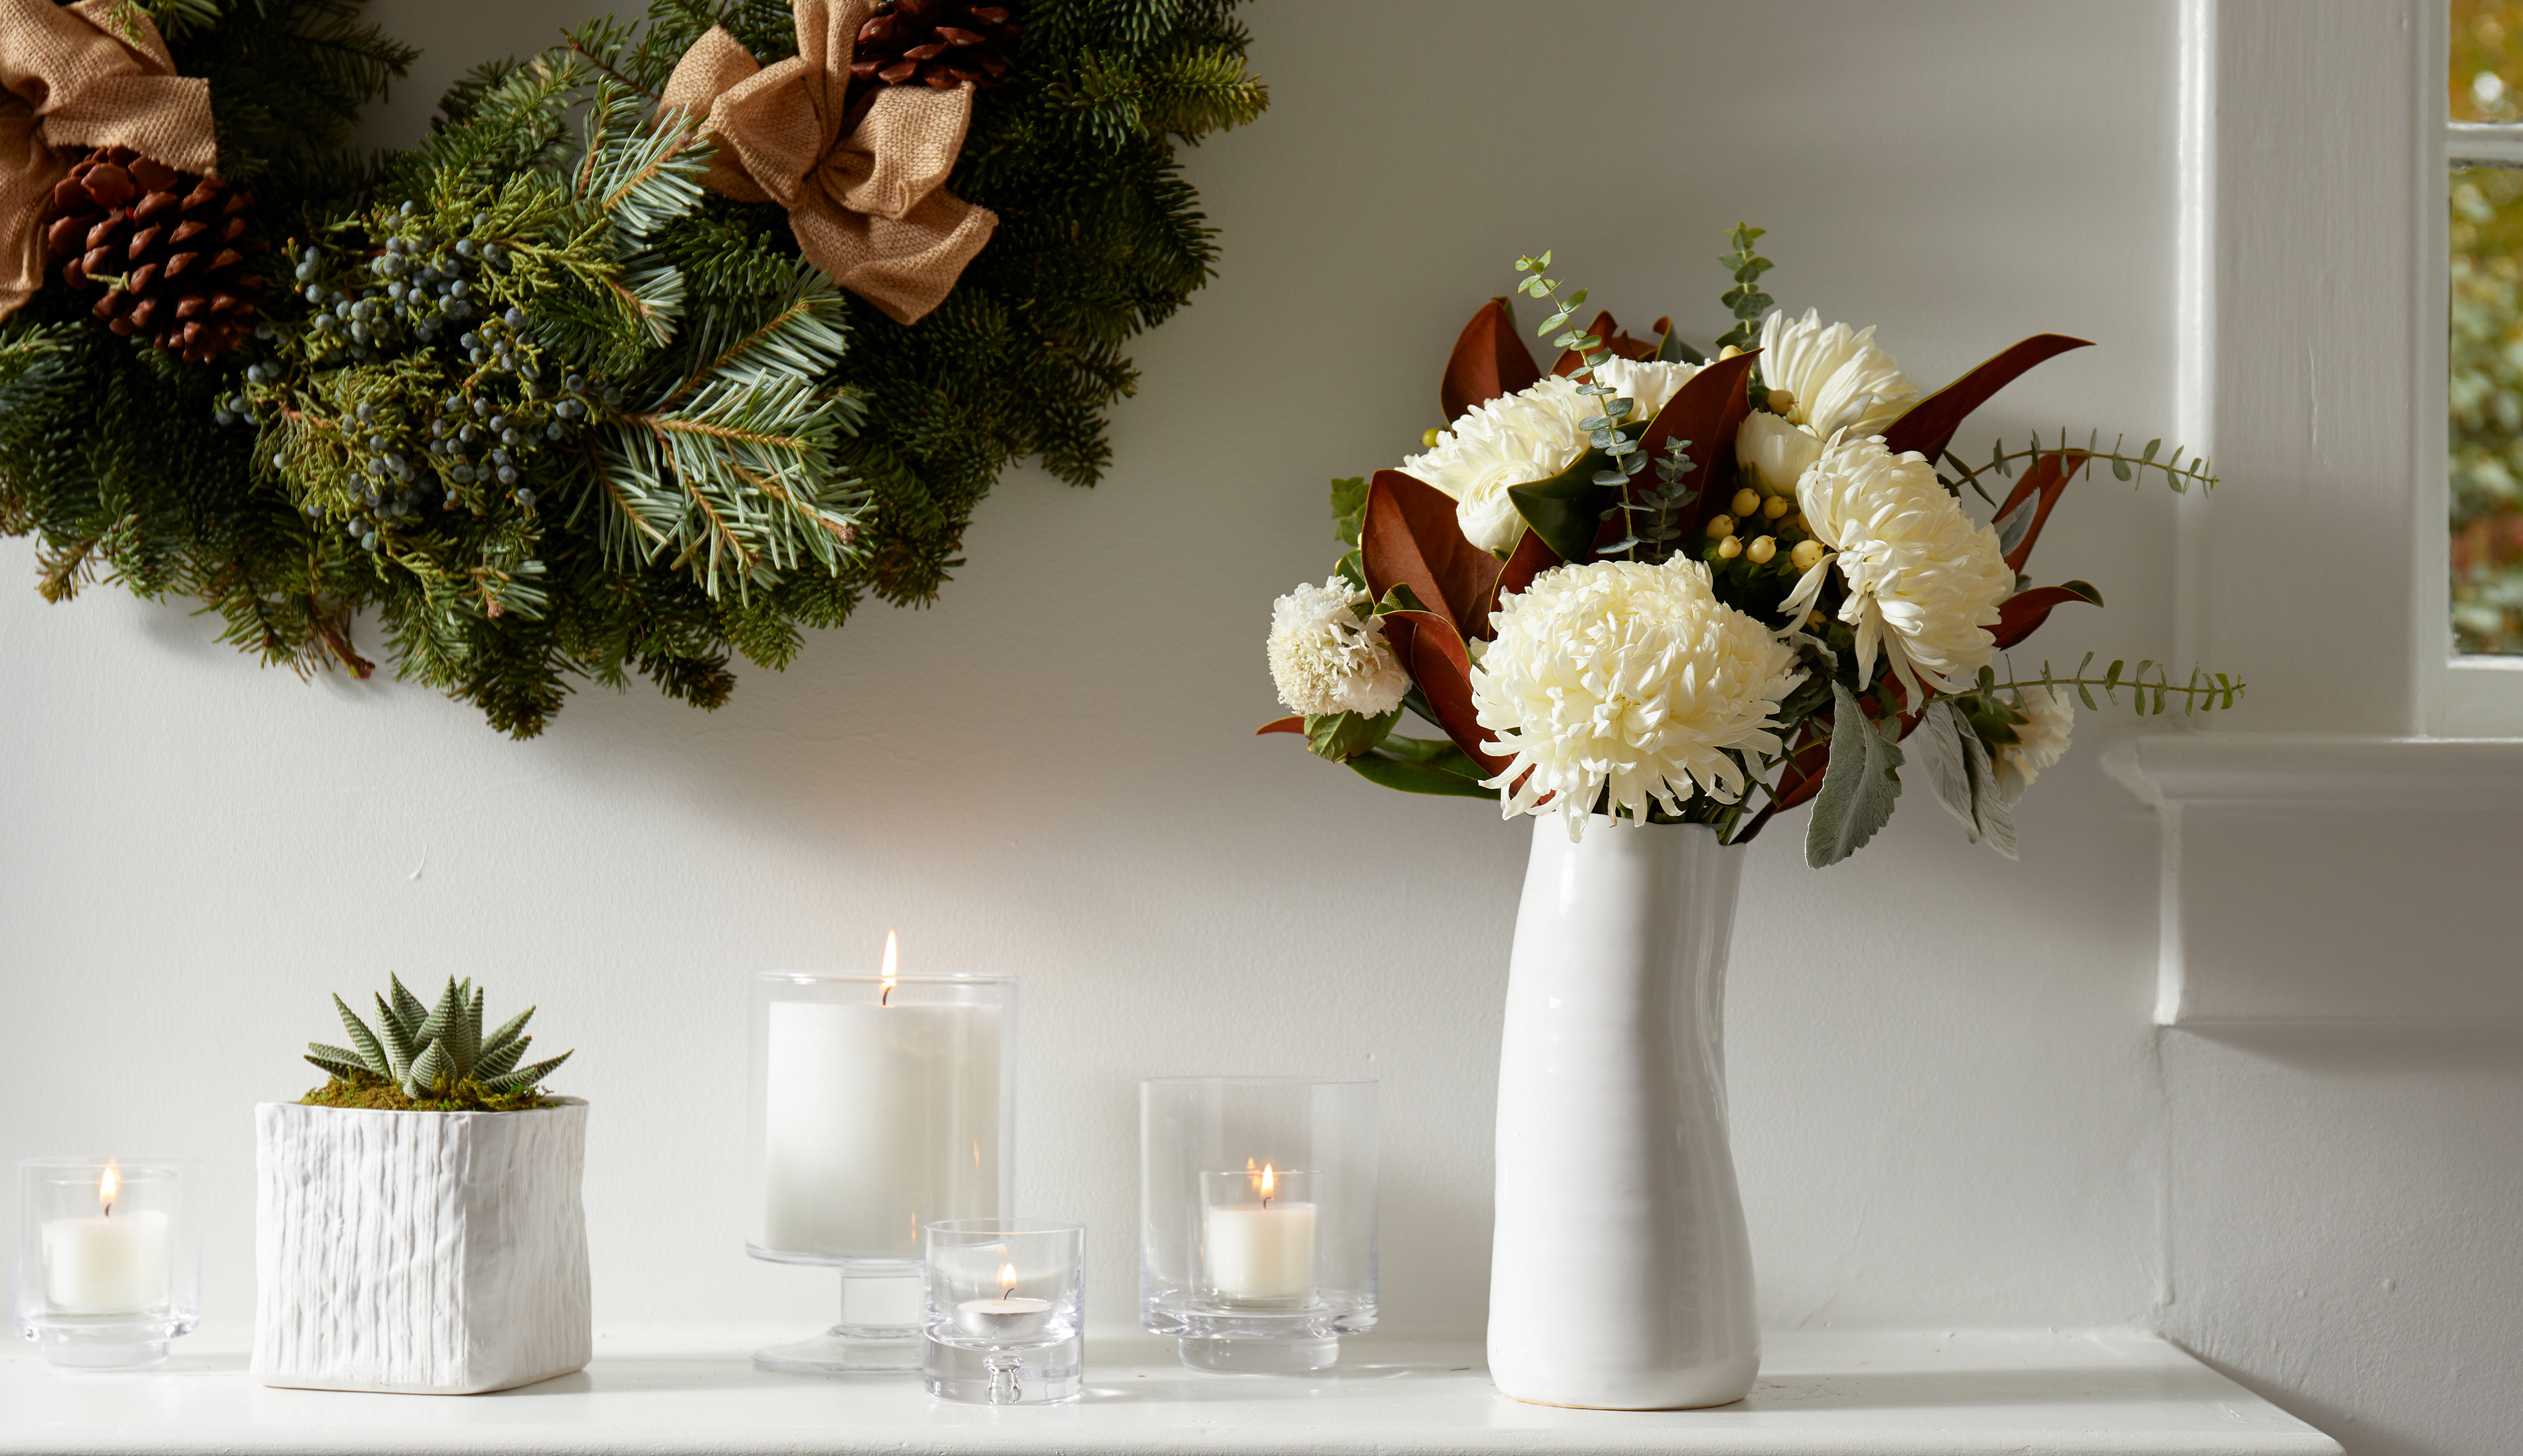 Magnolia bouquet and magnolia wreath for fall decorating